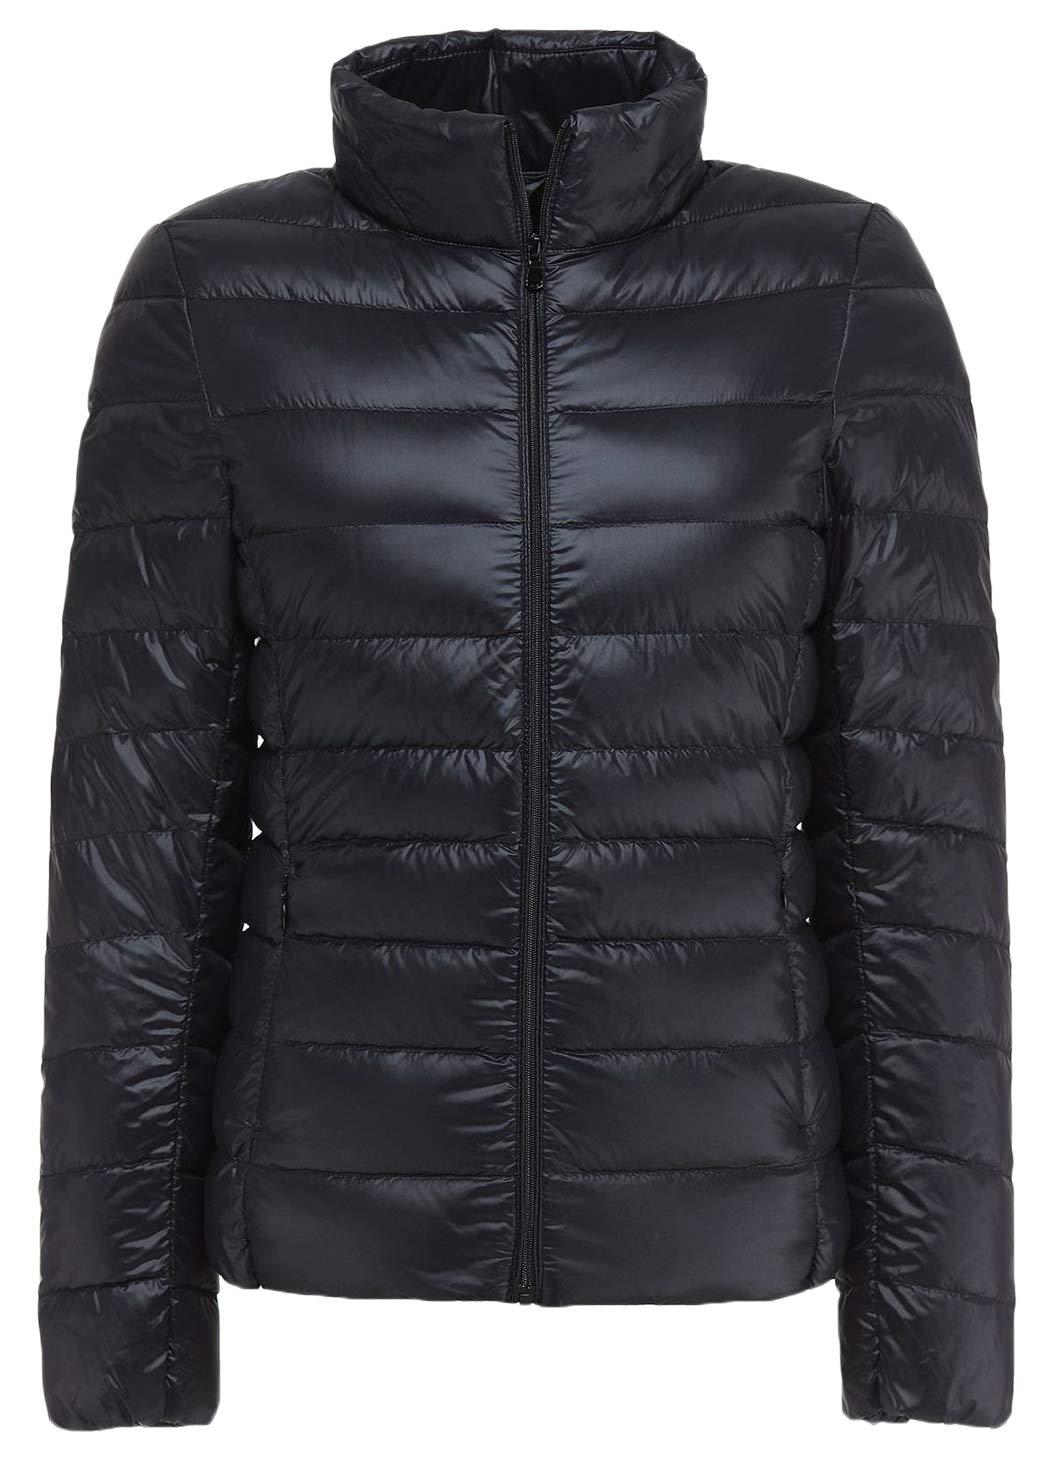 5356598d02c Galleon - Sawadikaa Women s Ultra Light Packable Winter Down Puffer Jacket  Coat Quilted Lightweight Down Parka Jacket Black X-Large